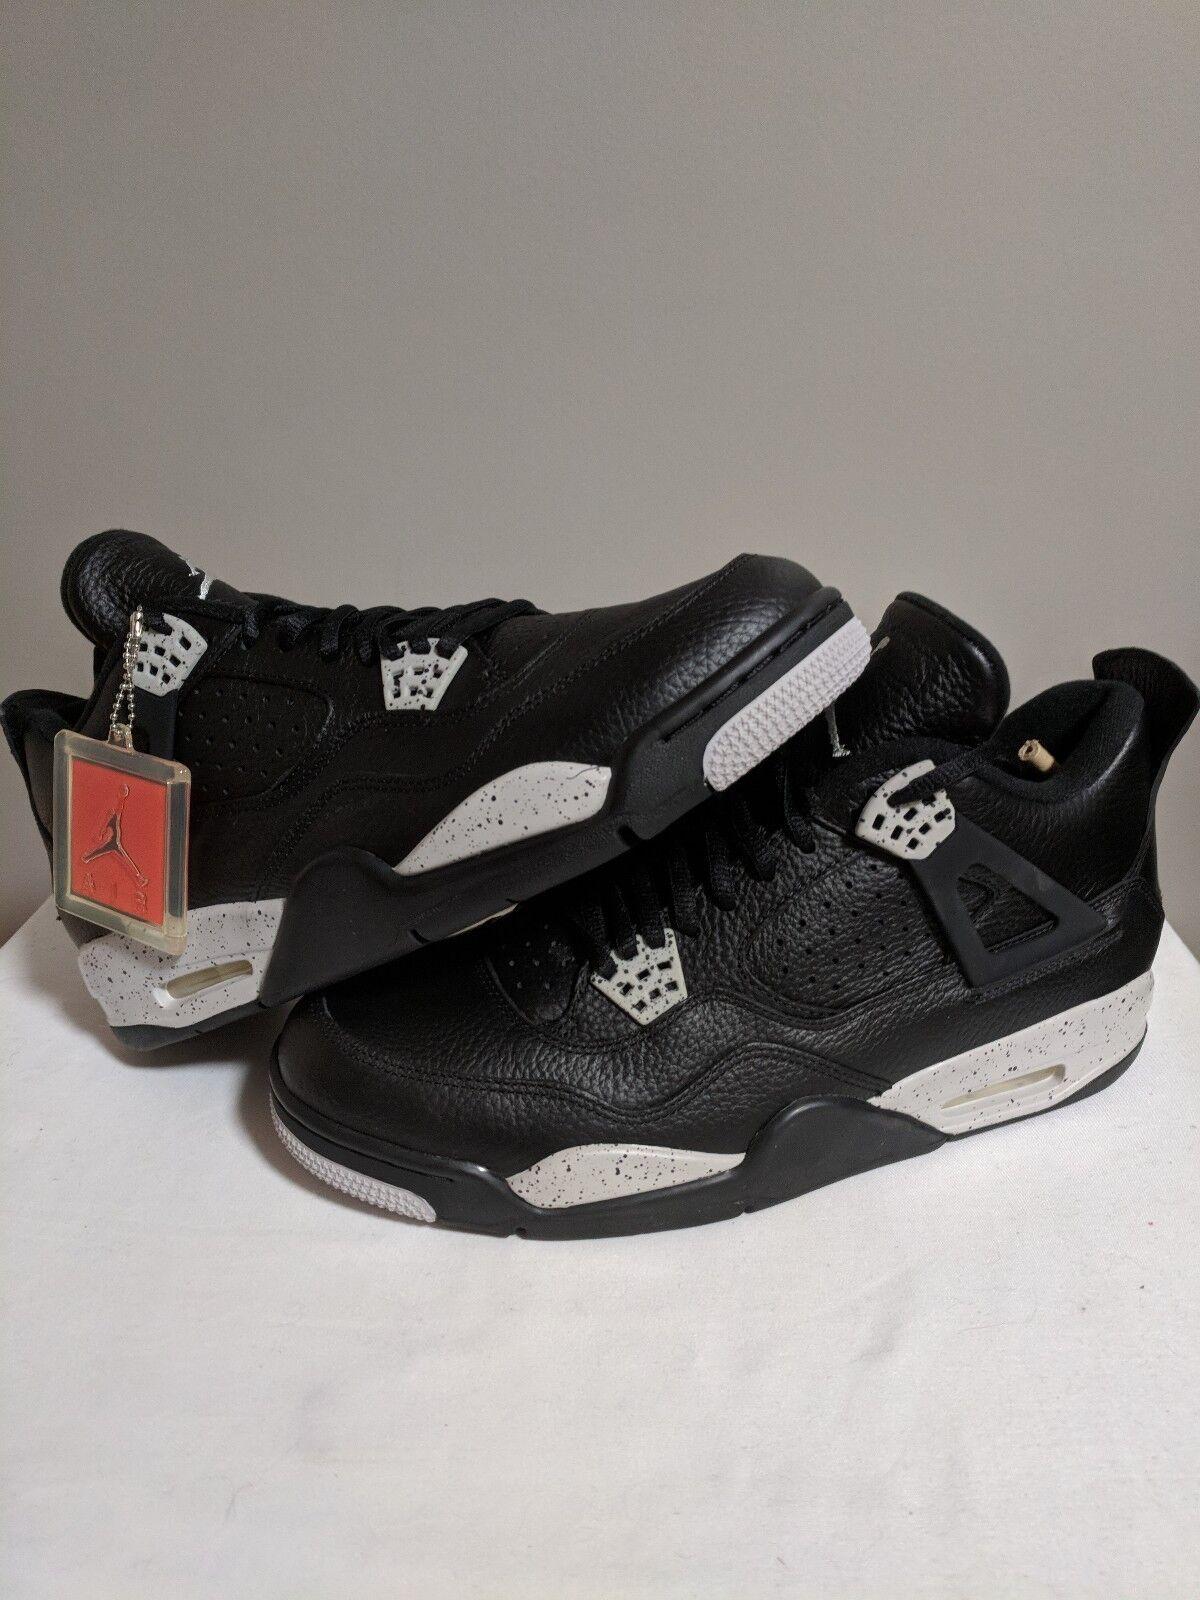 Jordan Retro 4 Oreo Negro gris blancoo